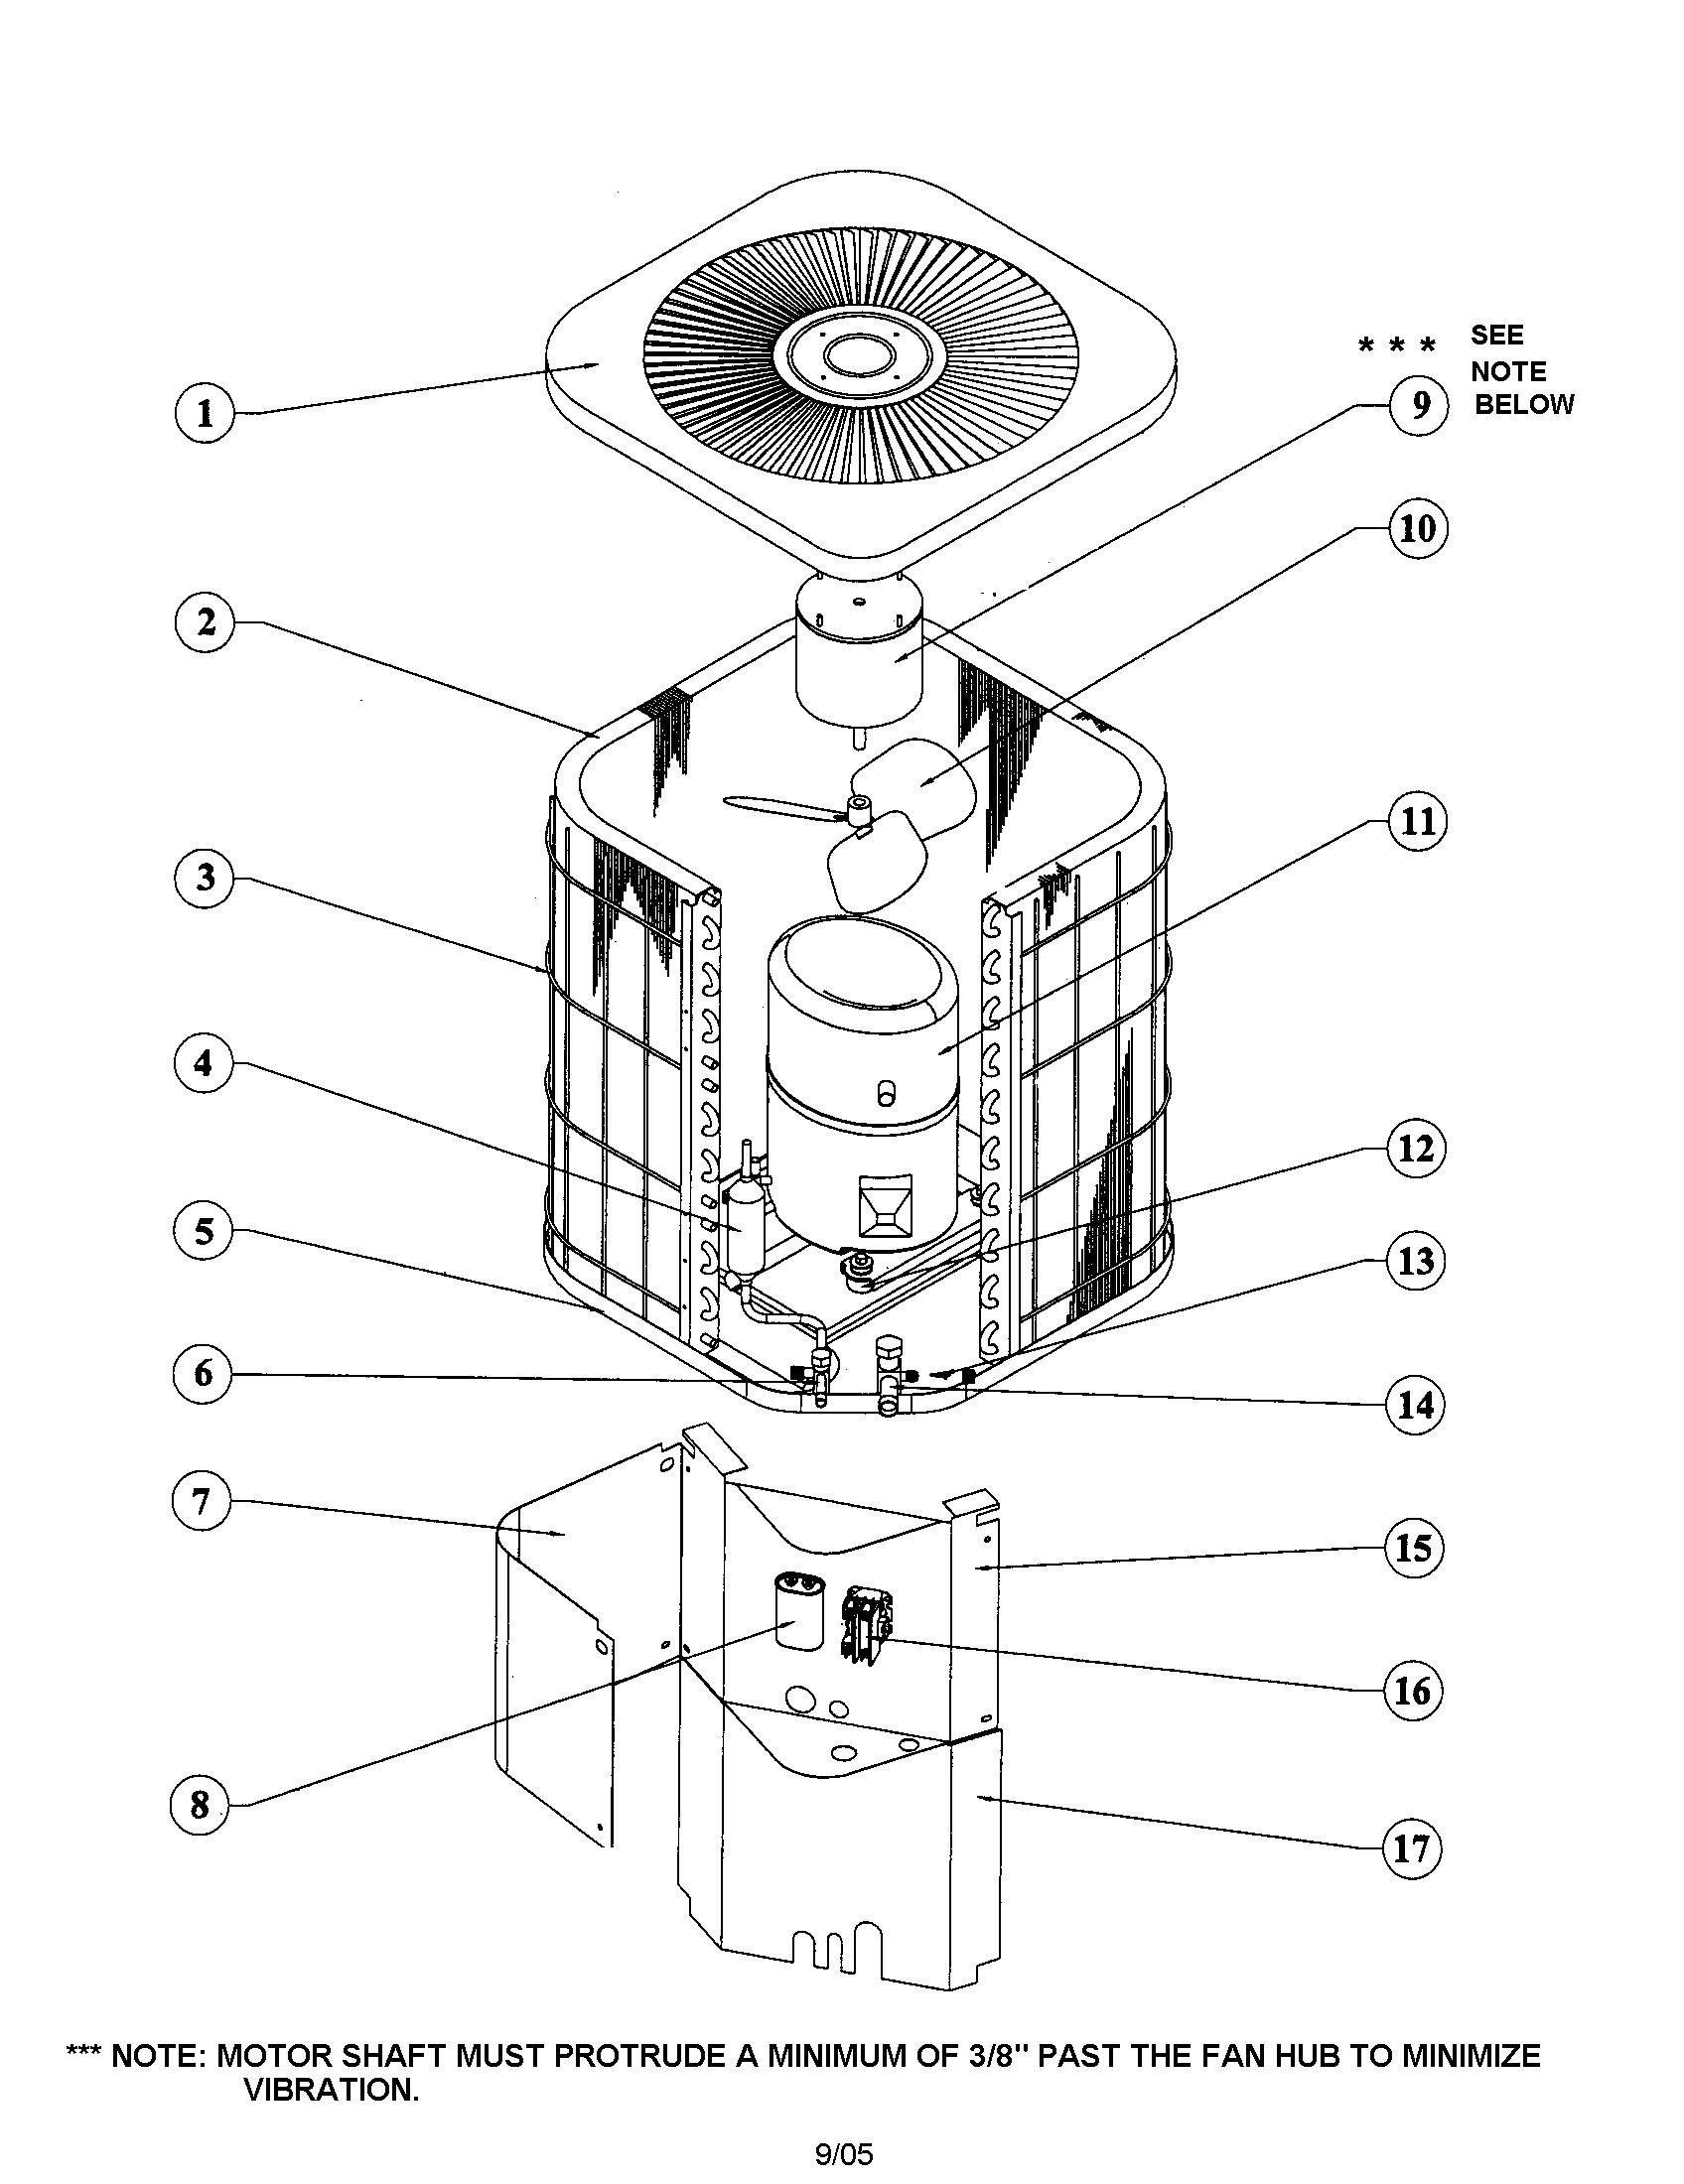 ac unit diagram and parts